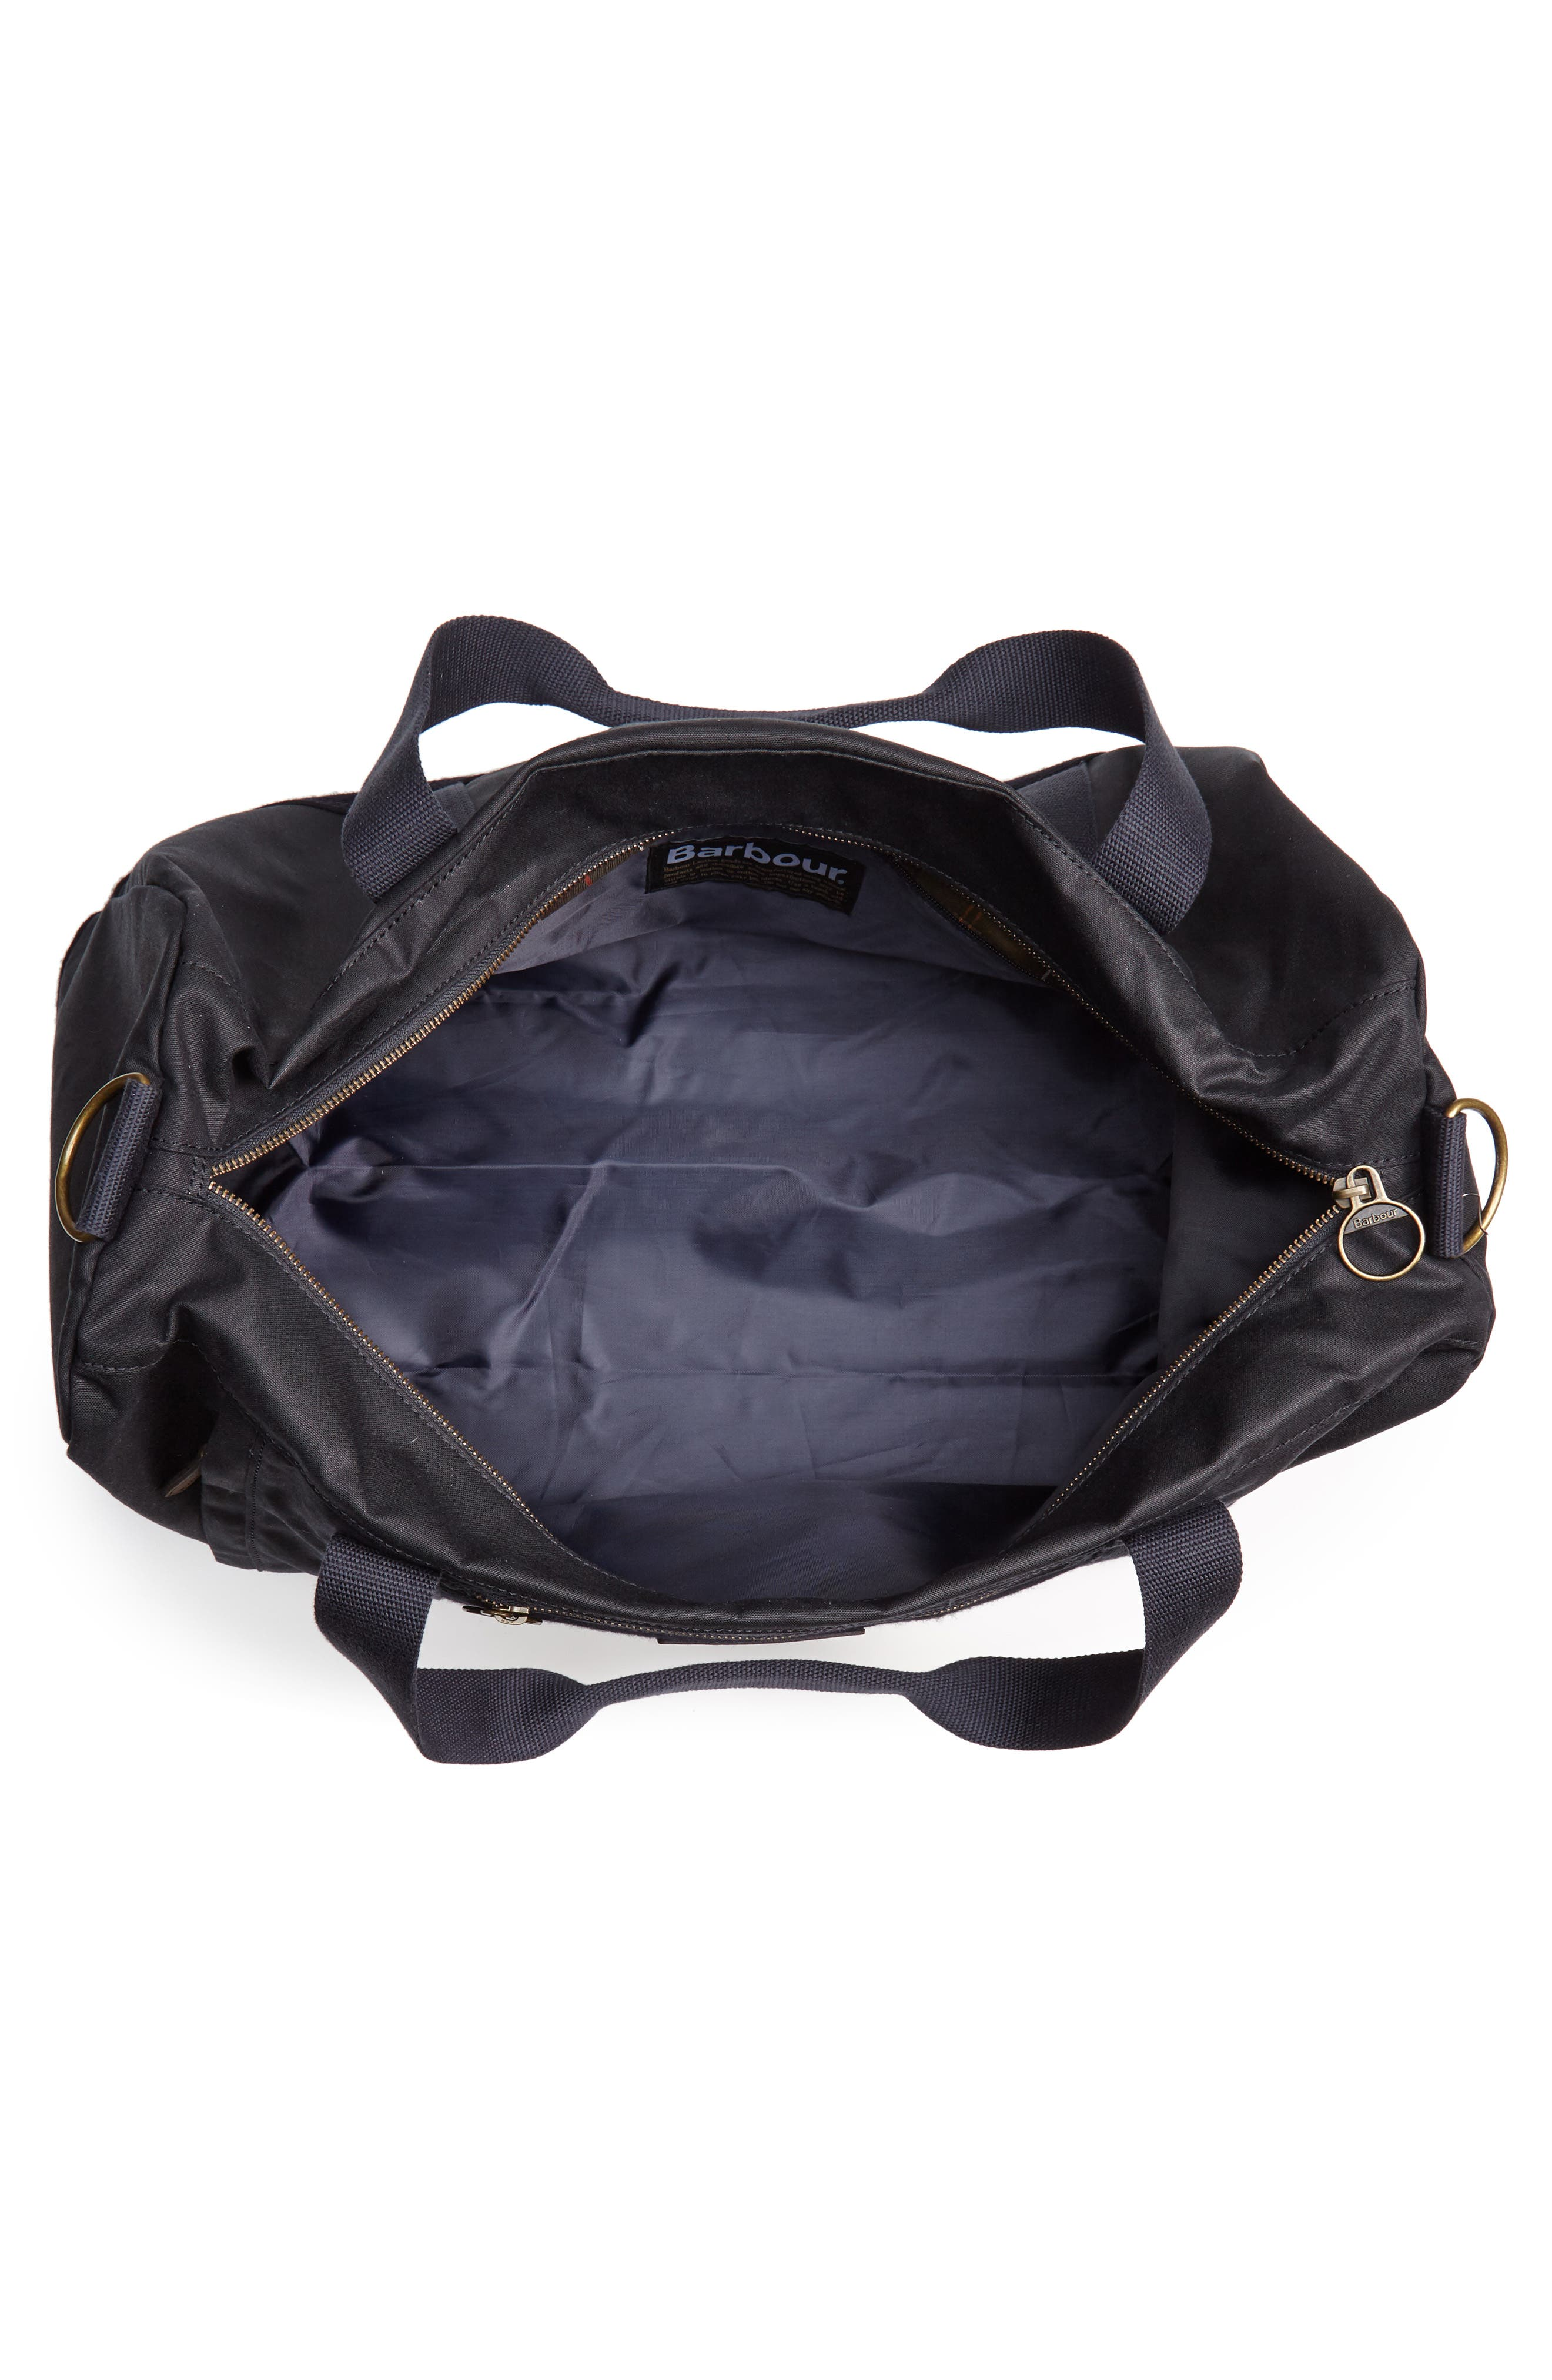 Gisburne Duffel Bag,                             Alternate thumbnail 4, color,                             400